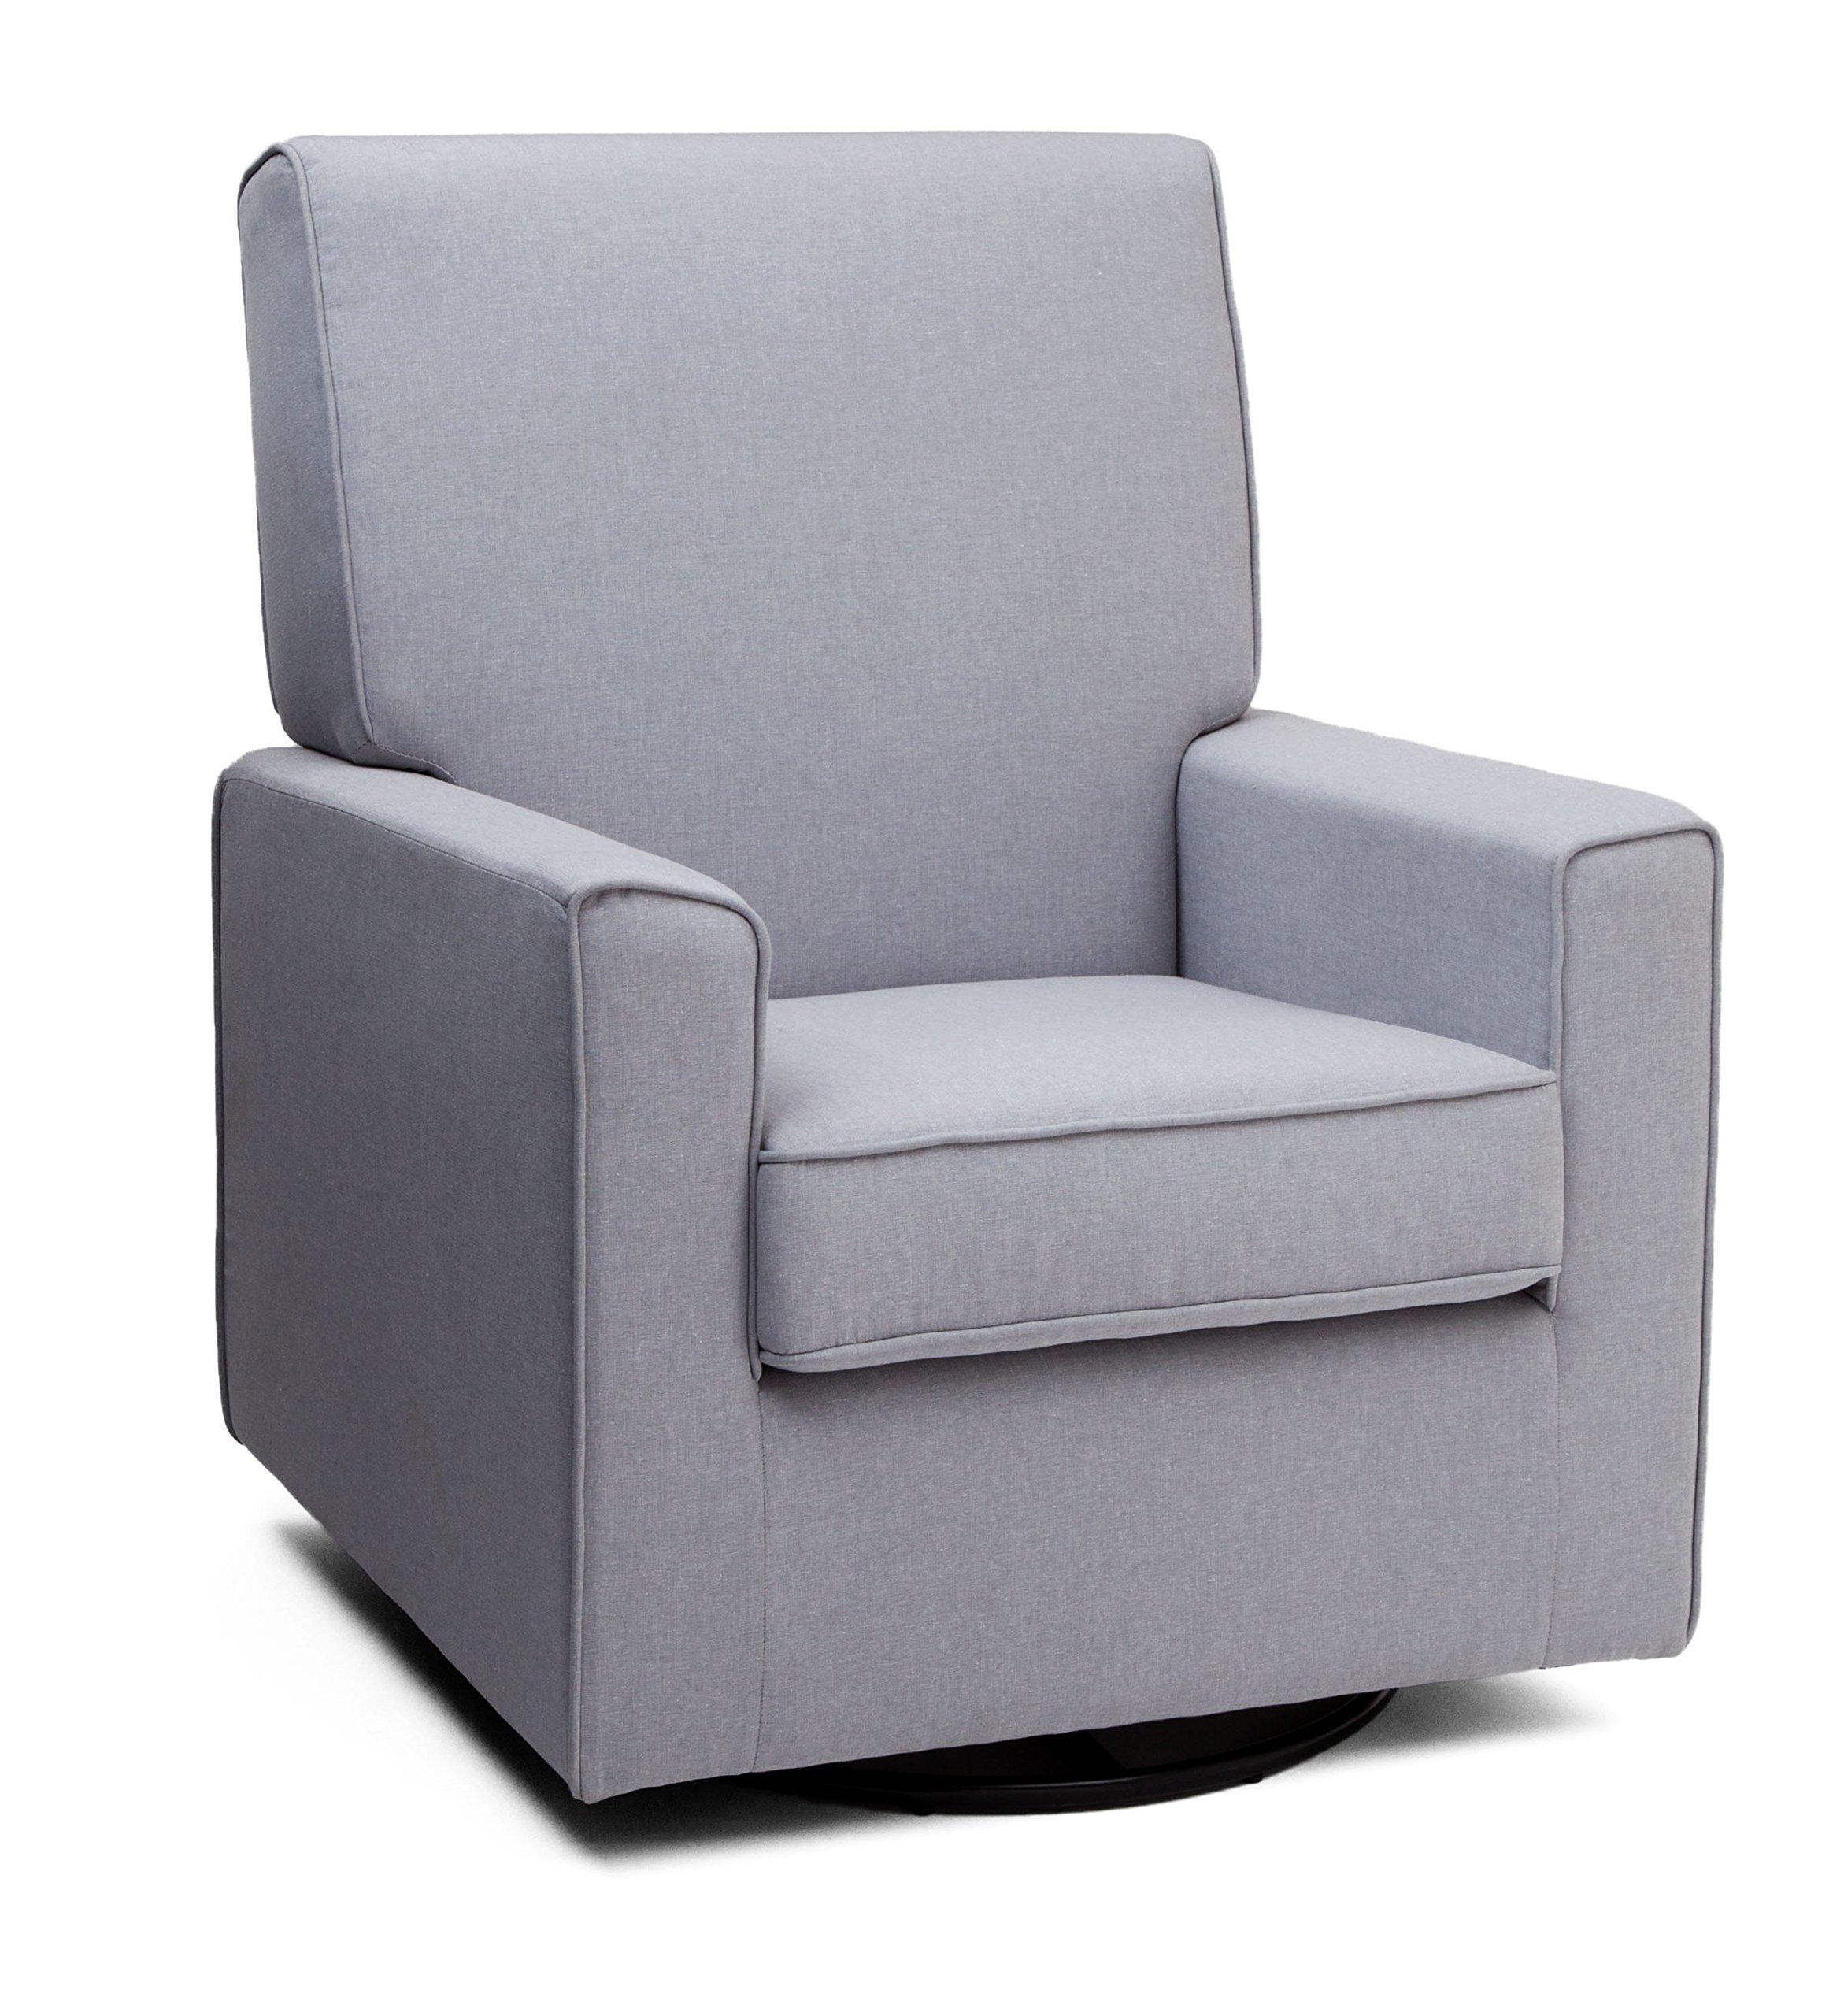 Delta Furniture Eva Upholstered Glider Swivel Rocker Chair, Heather Grey